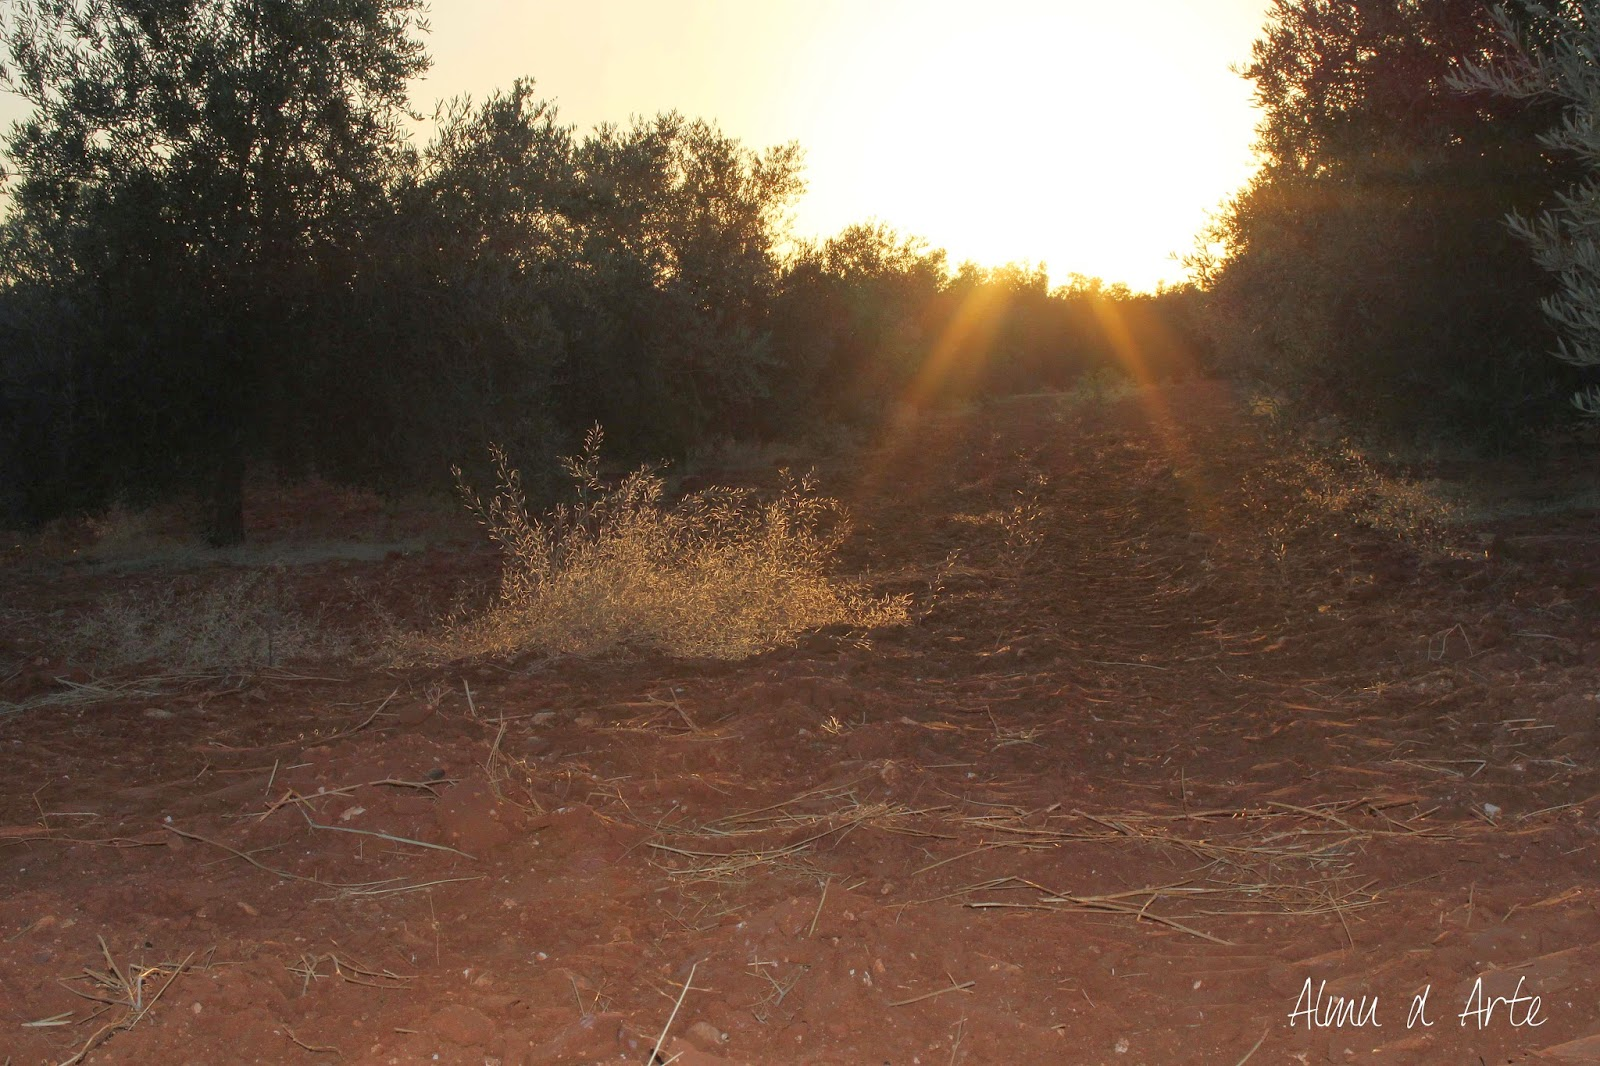 Atardecer en tierras andaluzas